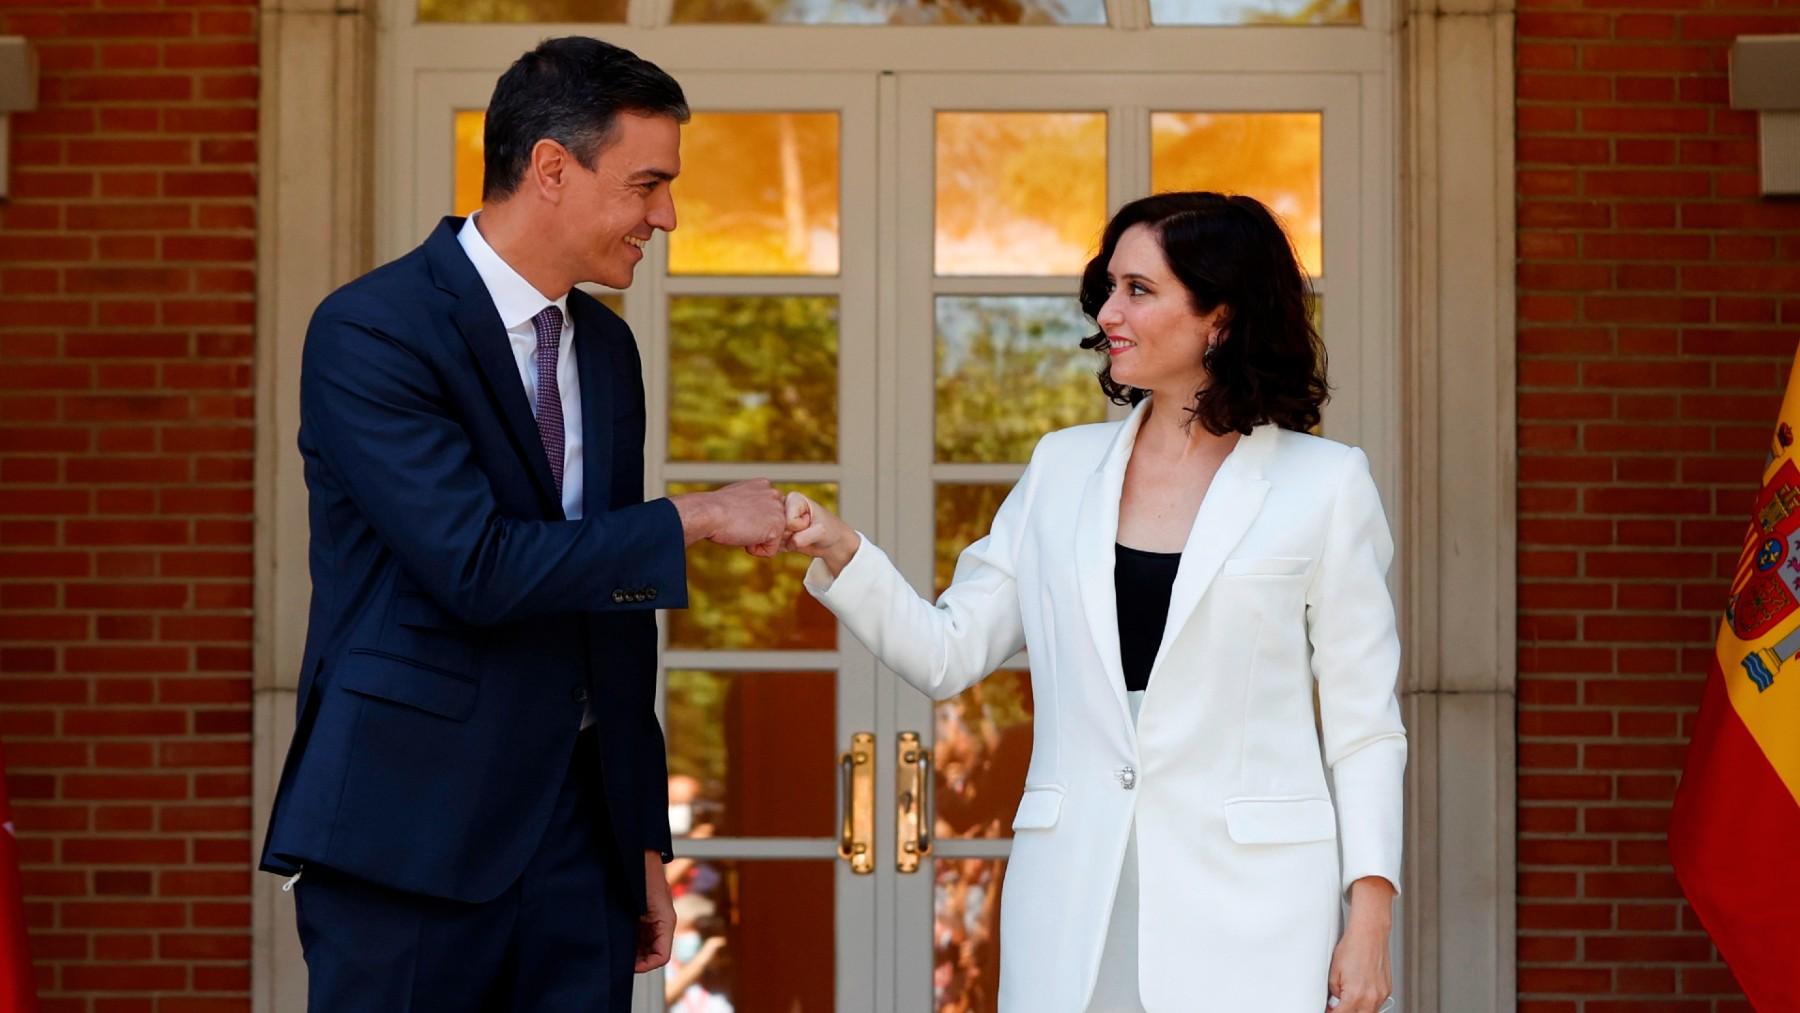 Pedro Sánchez e Isabel Díaz Ayuso en La Moncloa. (Foto: Efe)